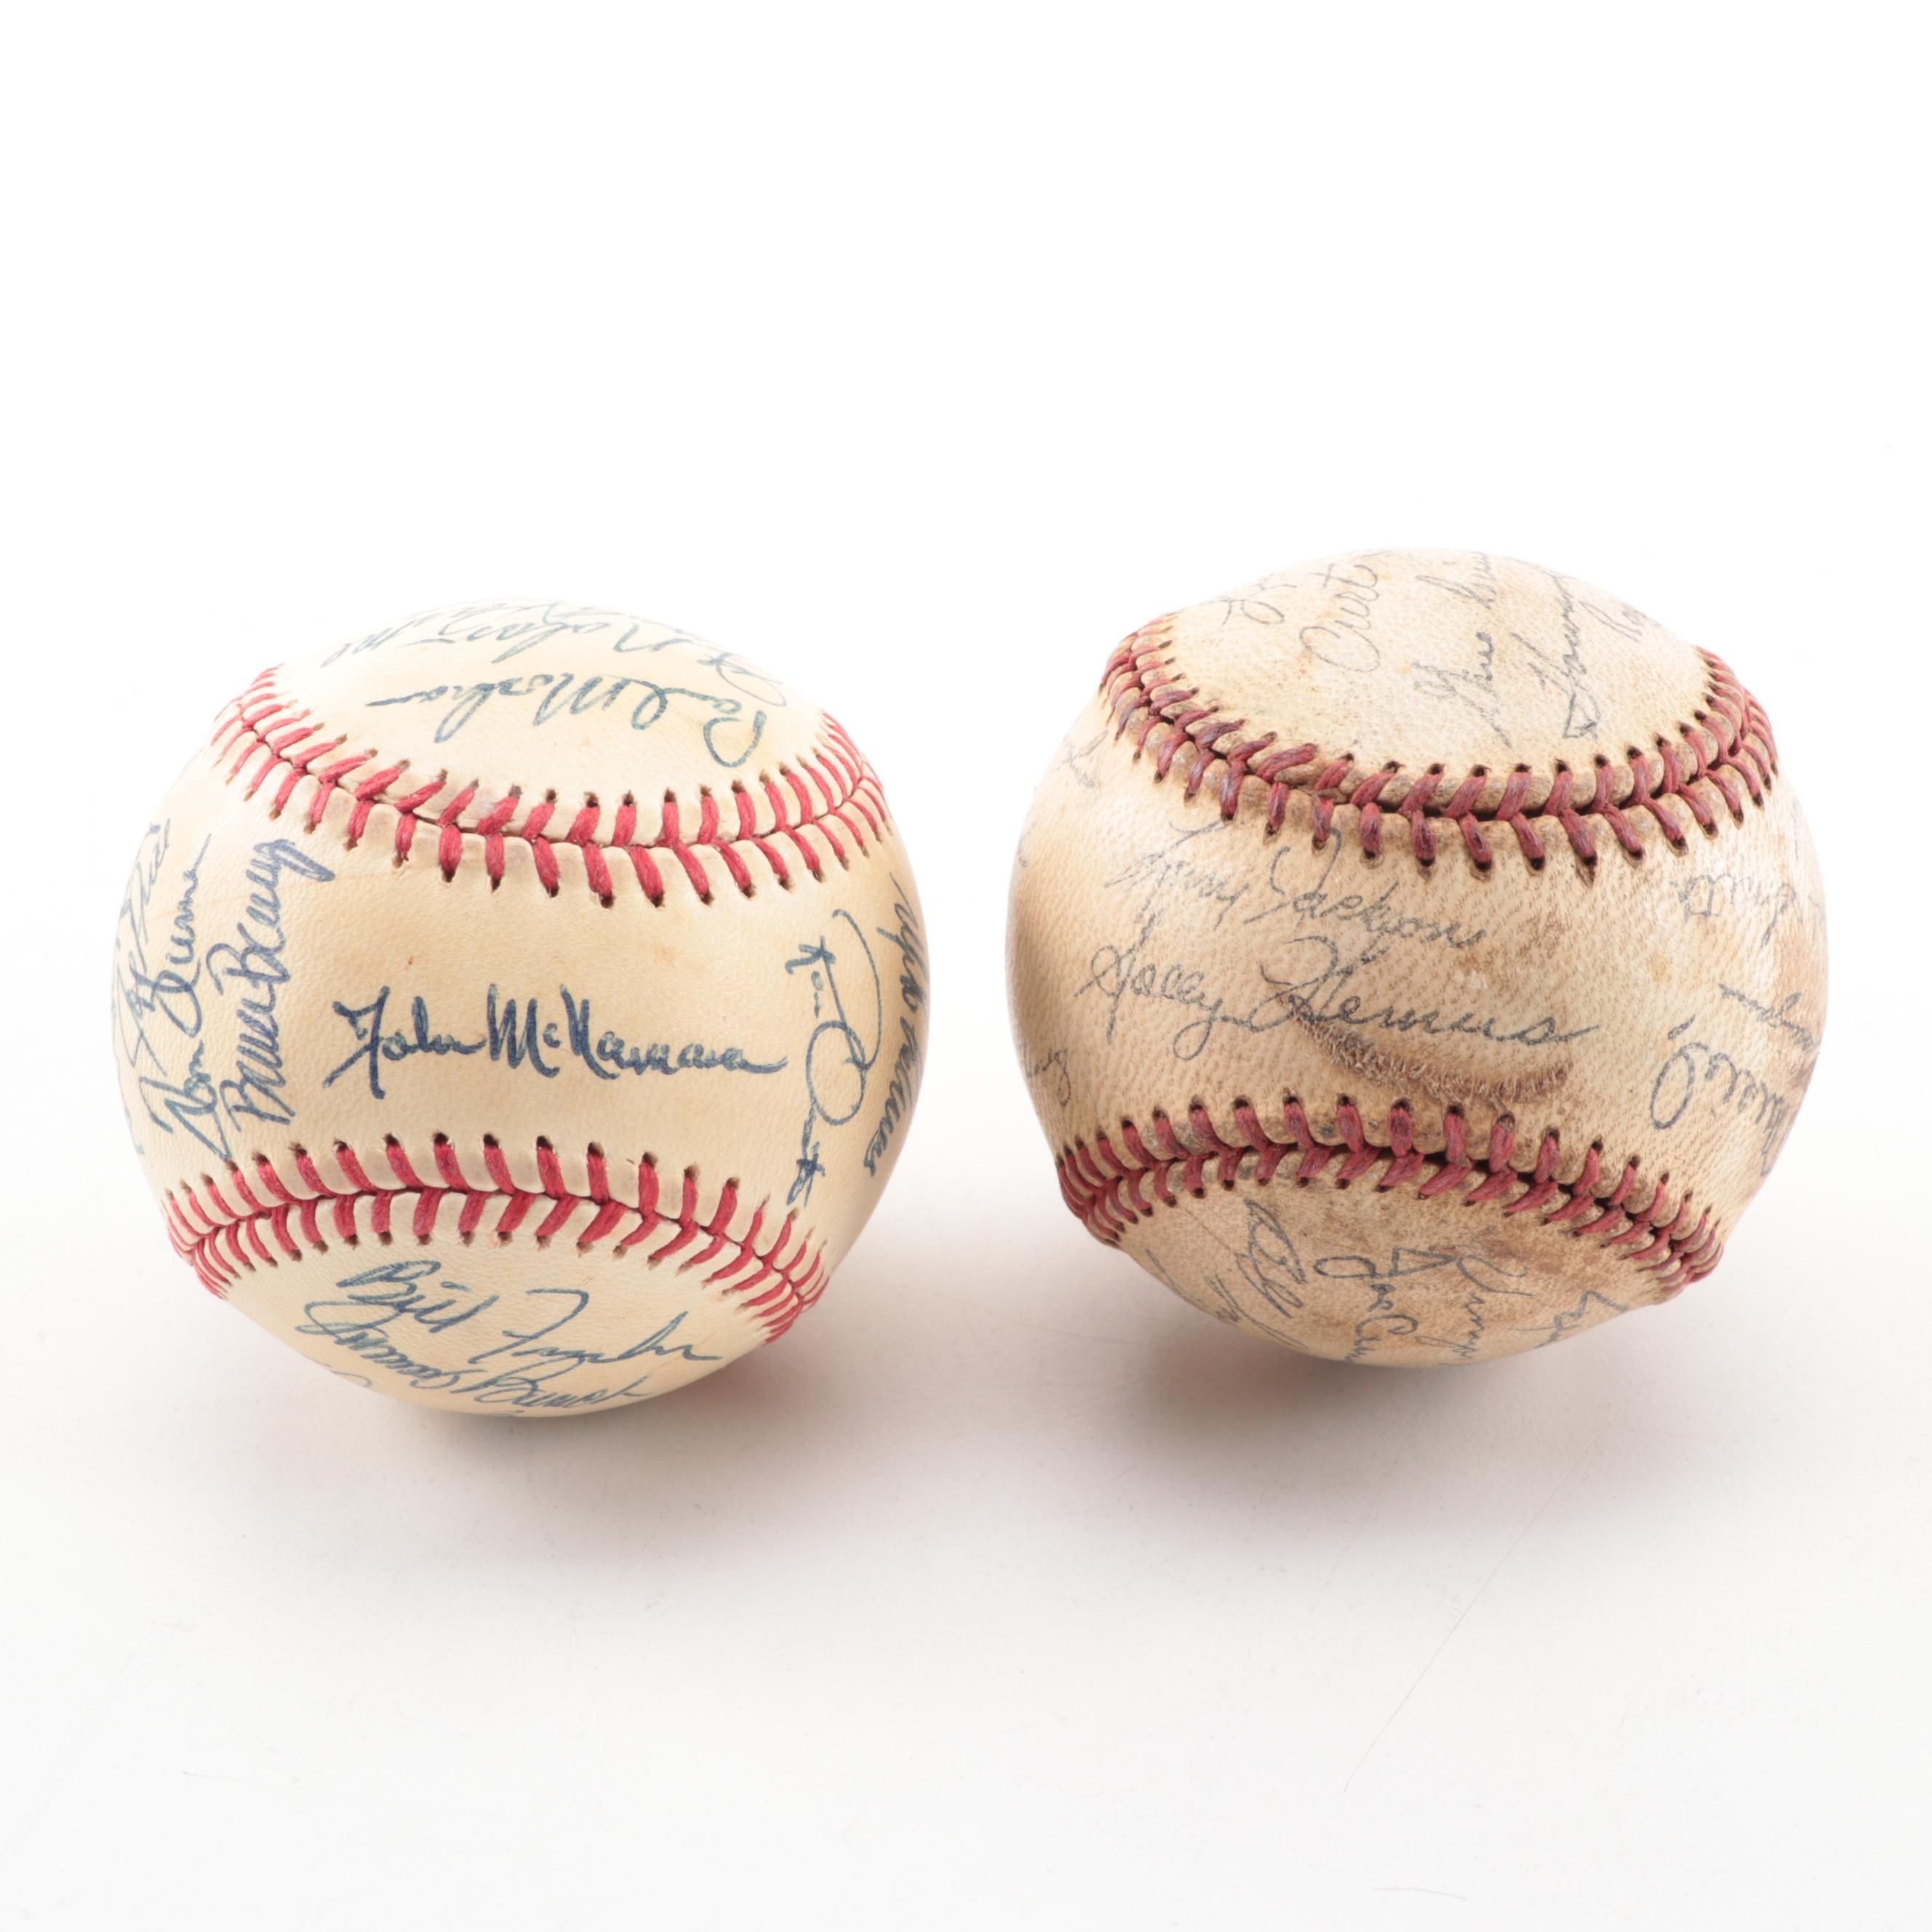 1981 Autographed Cincinnati Reds Baseball and 1959 Stamped Cardinals Baseball